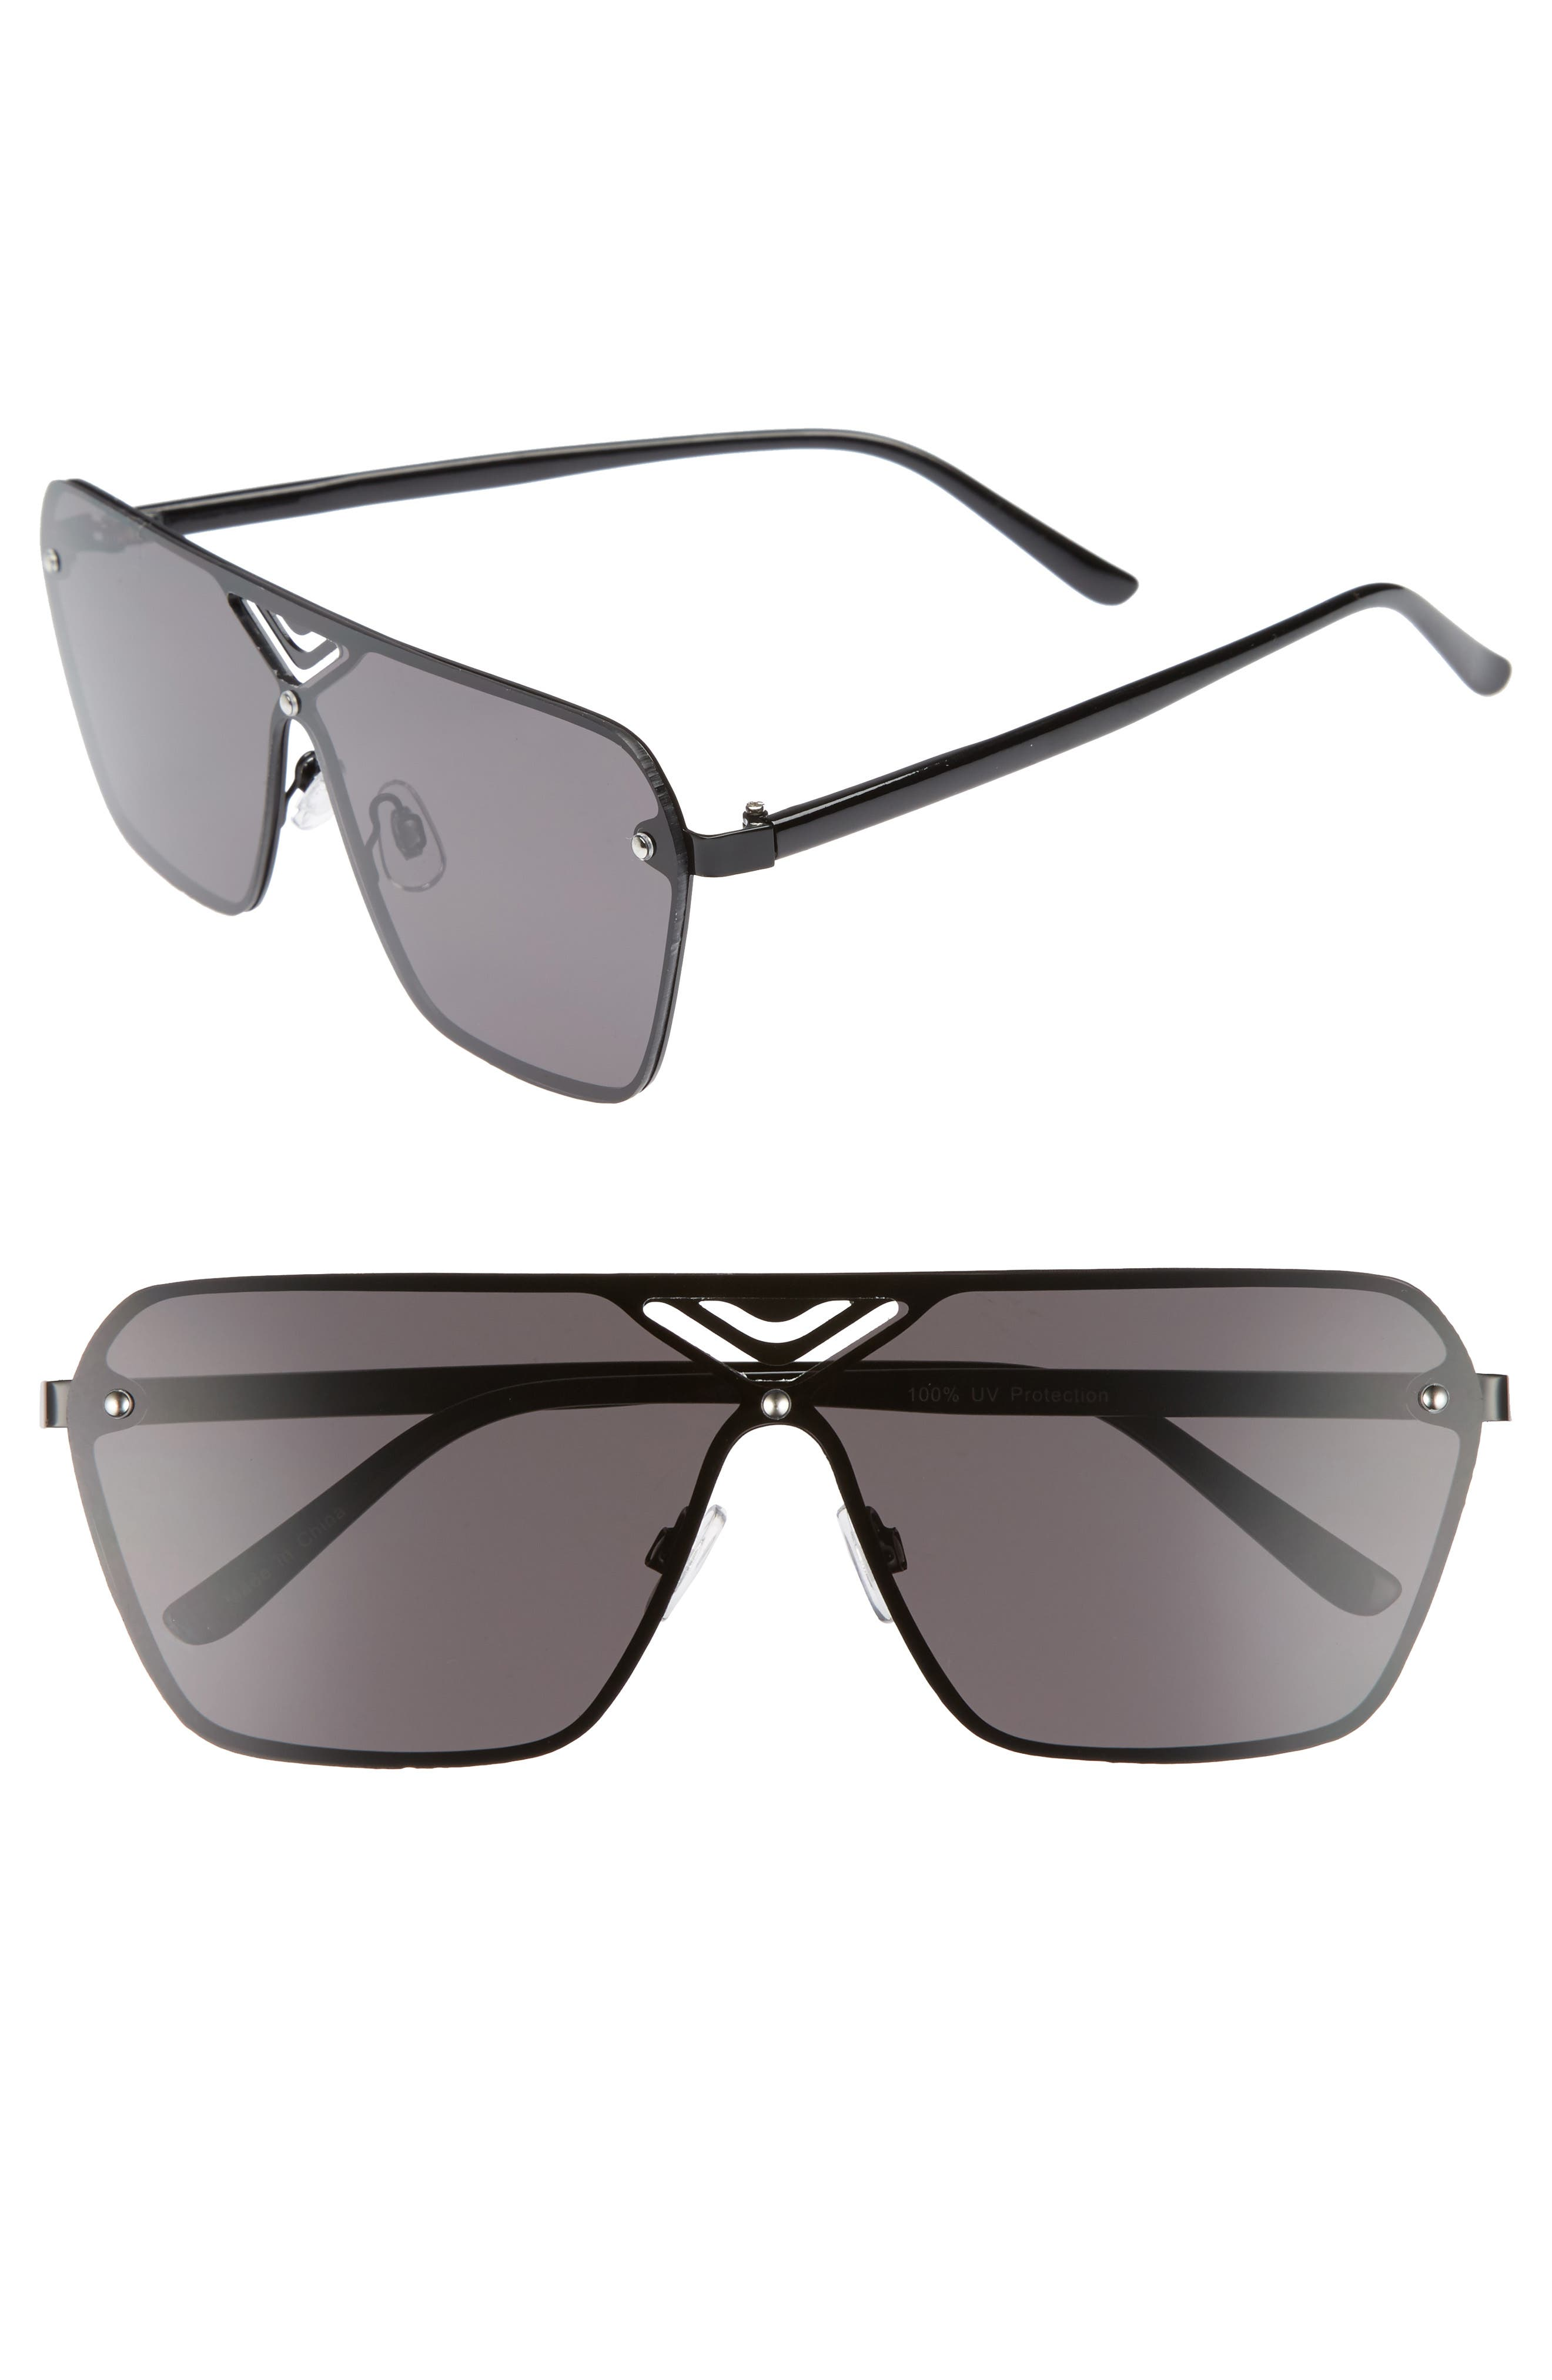 70mm Cutout Shield Sunglasses,                             Main thumbnail 1, color,                             001